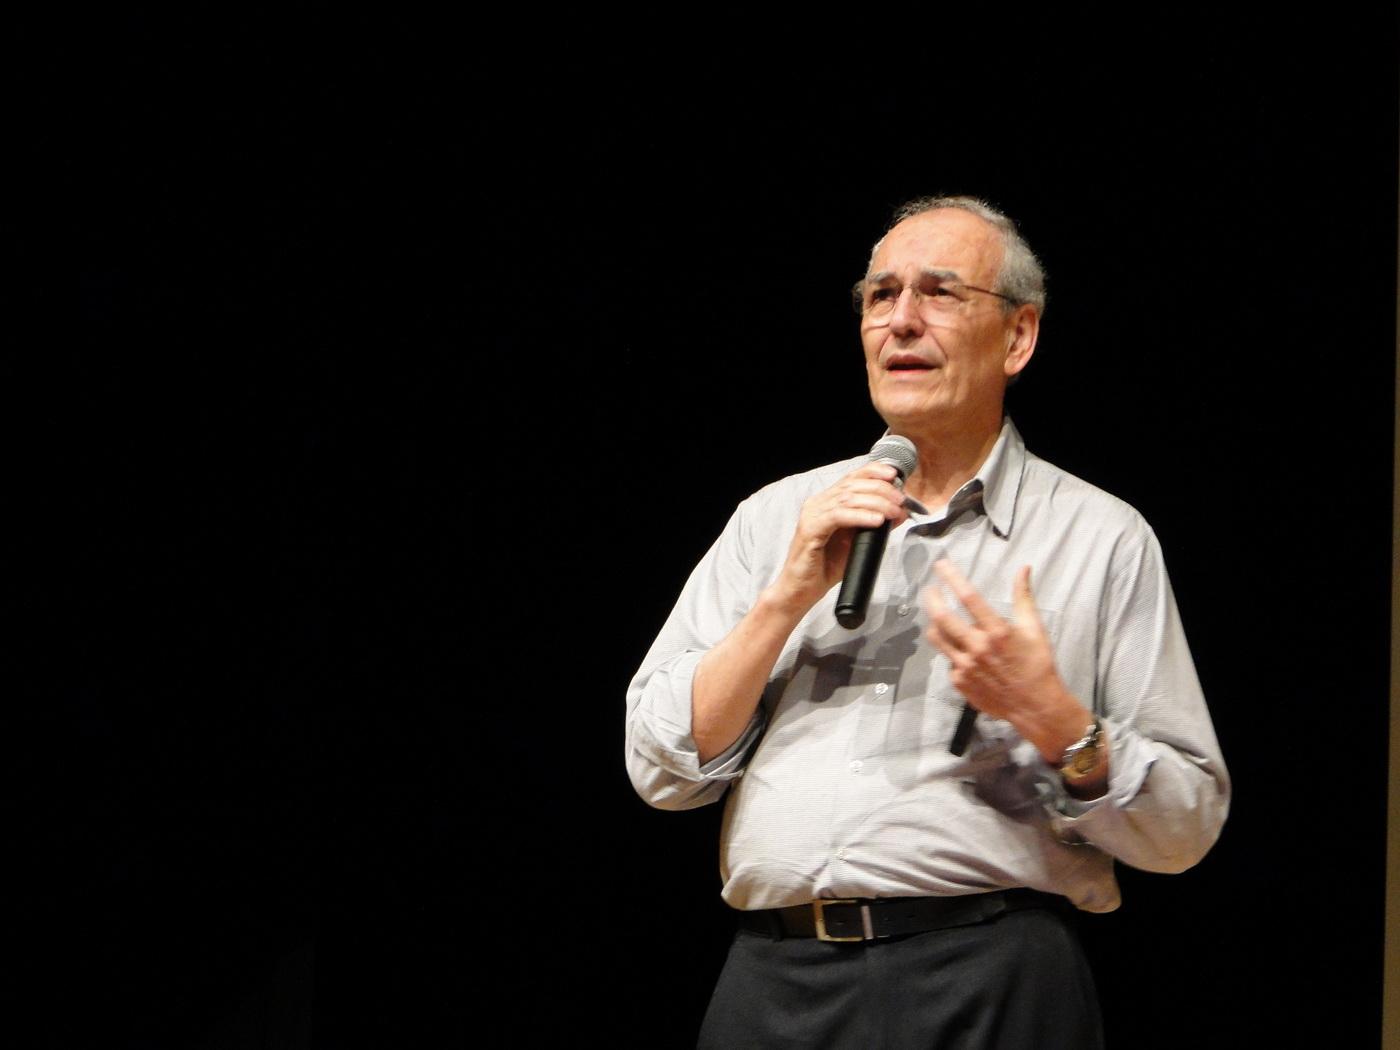 Prof Dr. Jose Moran